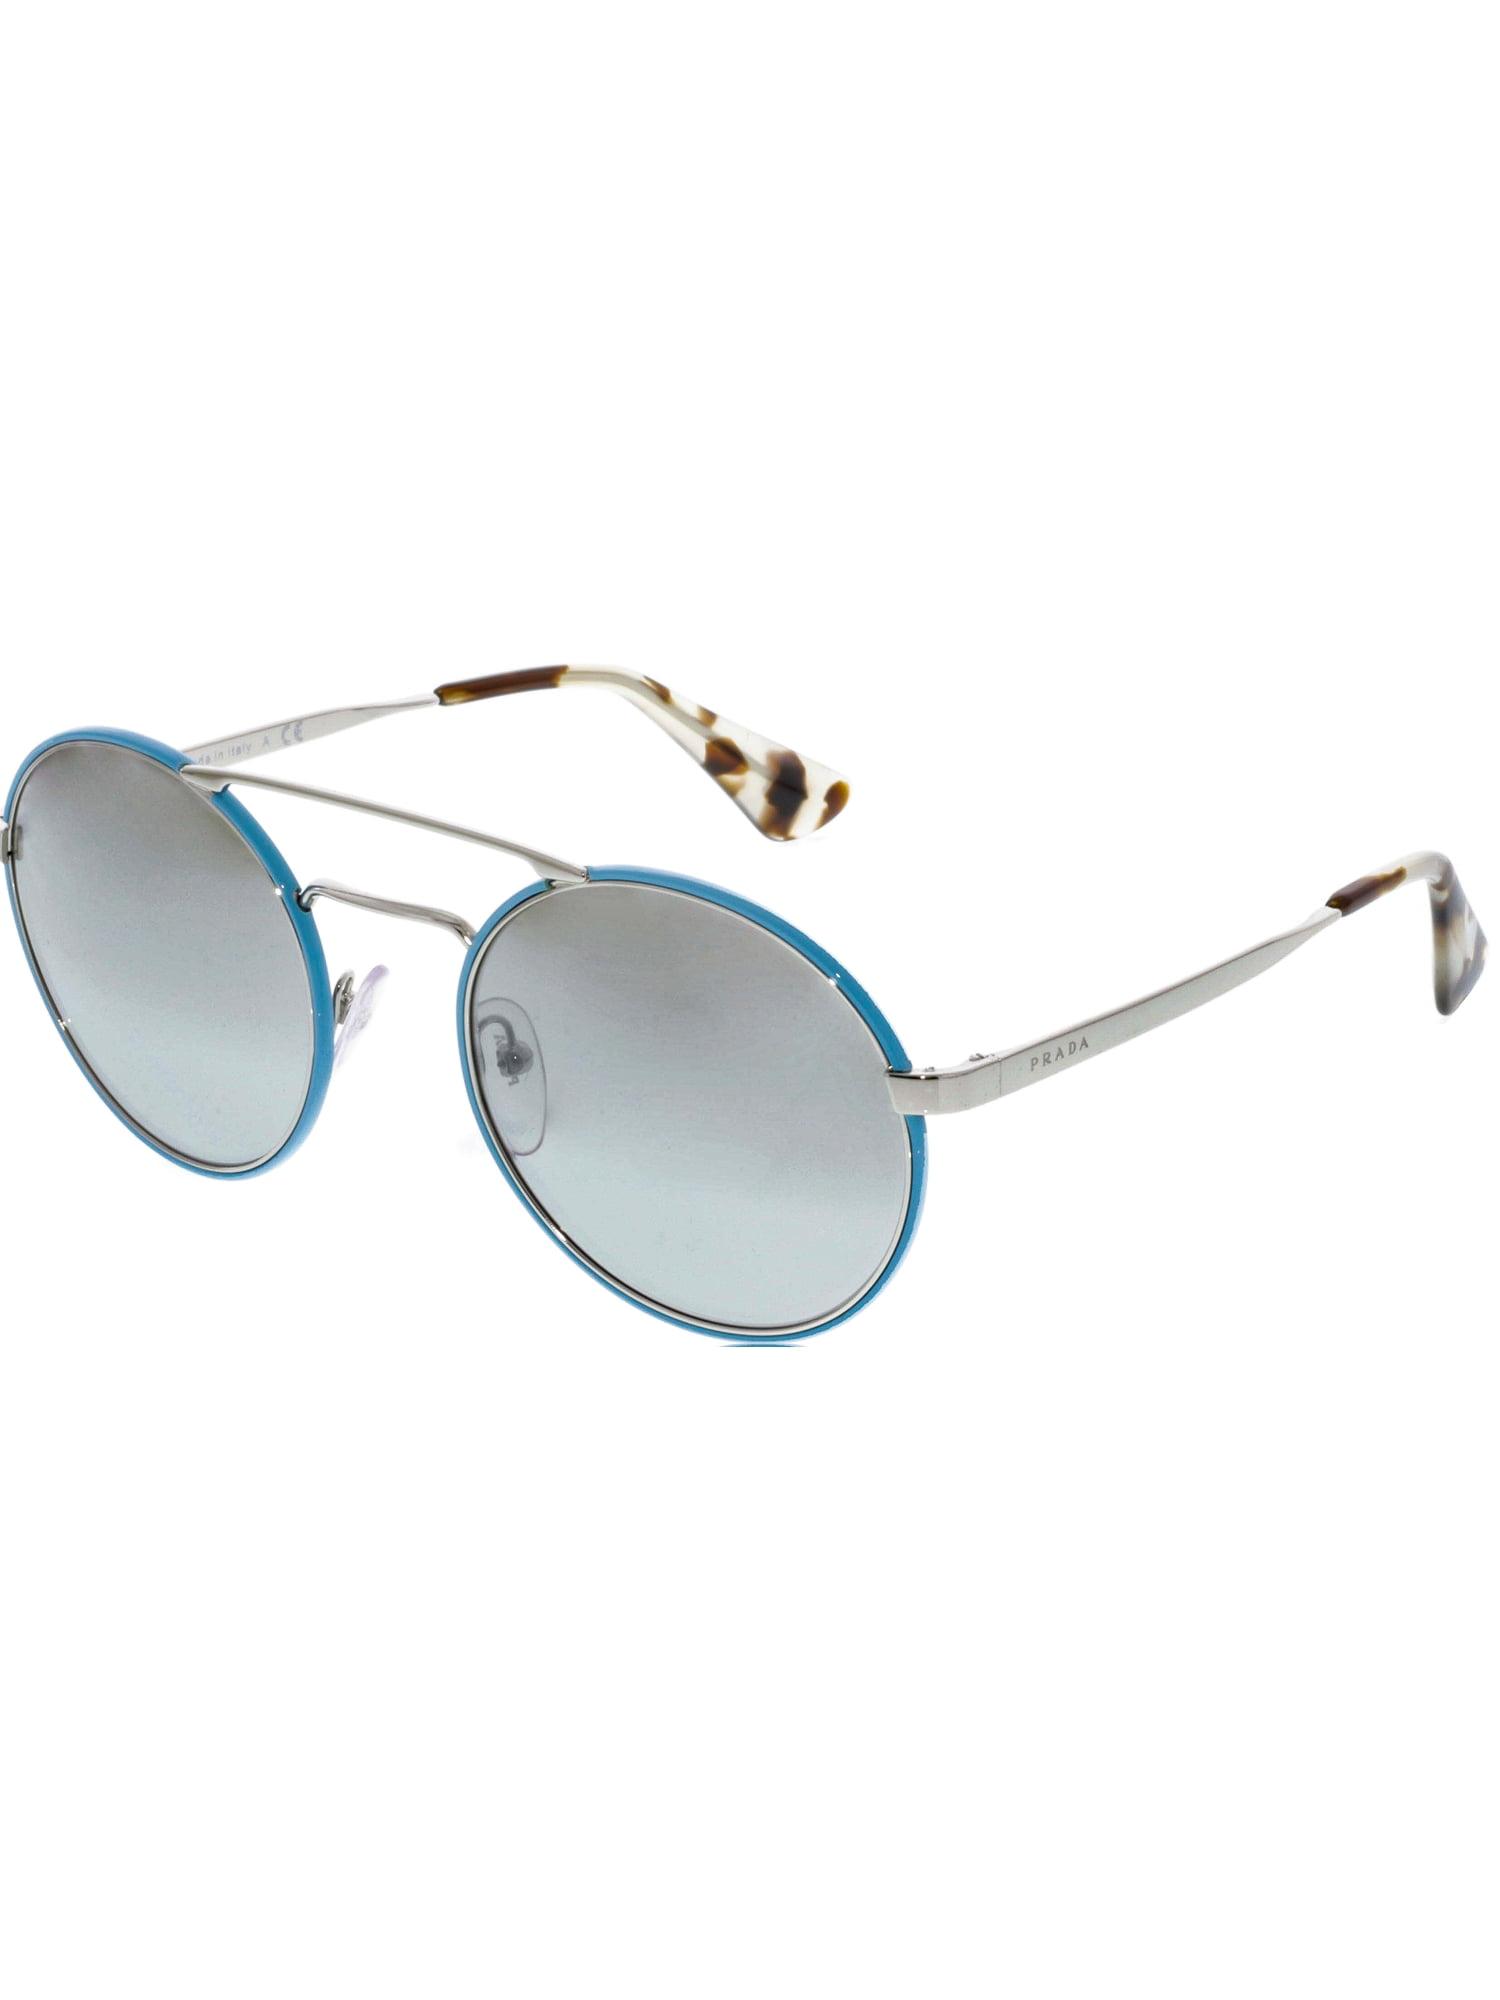 f0672625469 Prada Women s Mirrored PR51SS-VHT1A0-54 Blue Round Sunglasses